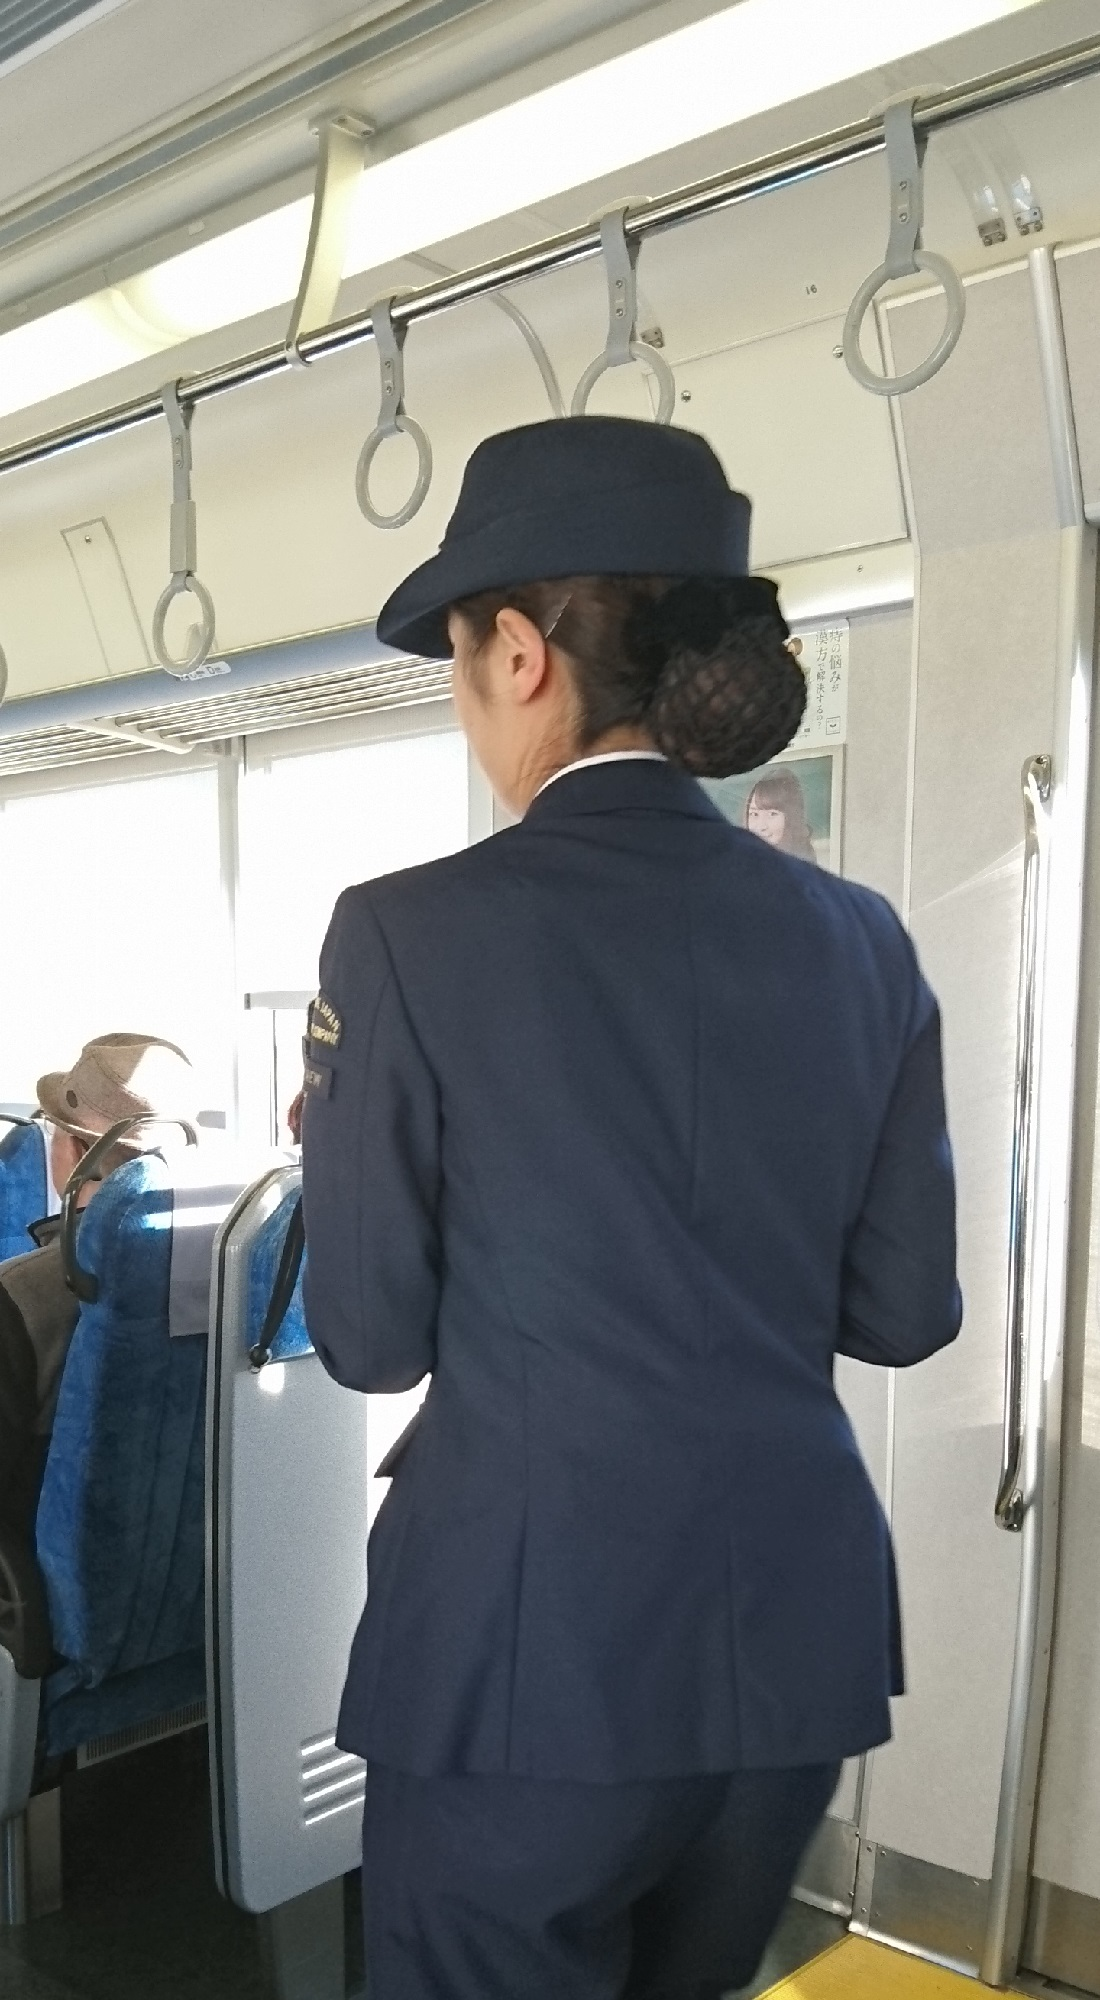 2016.11.16 東海道線 (5) 大垣いき特別快速 - 車内 1100-2000